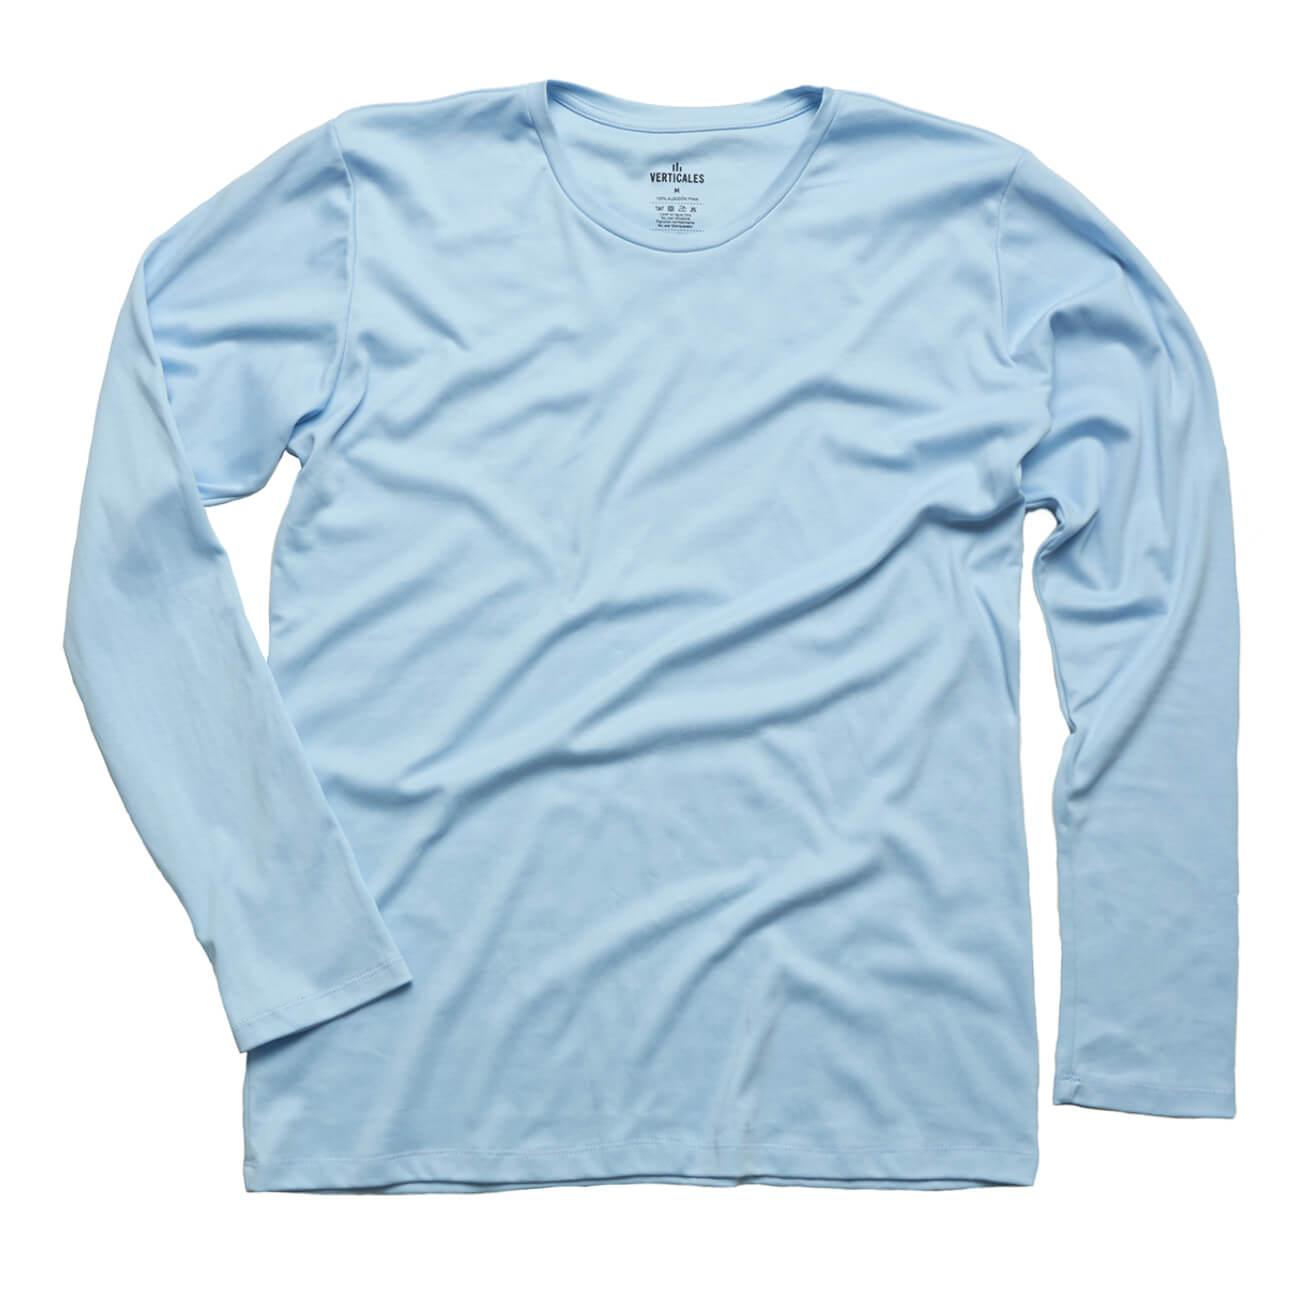 Franela basica Verticales caballero manga larga azul claro espalda